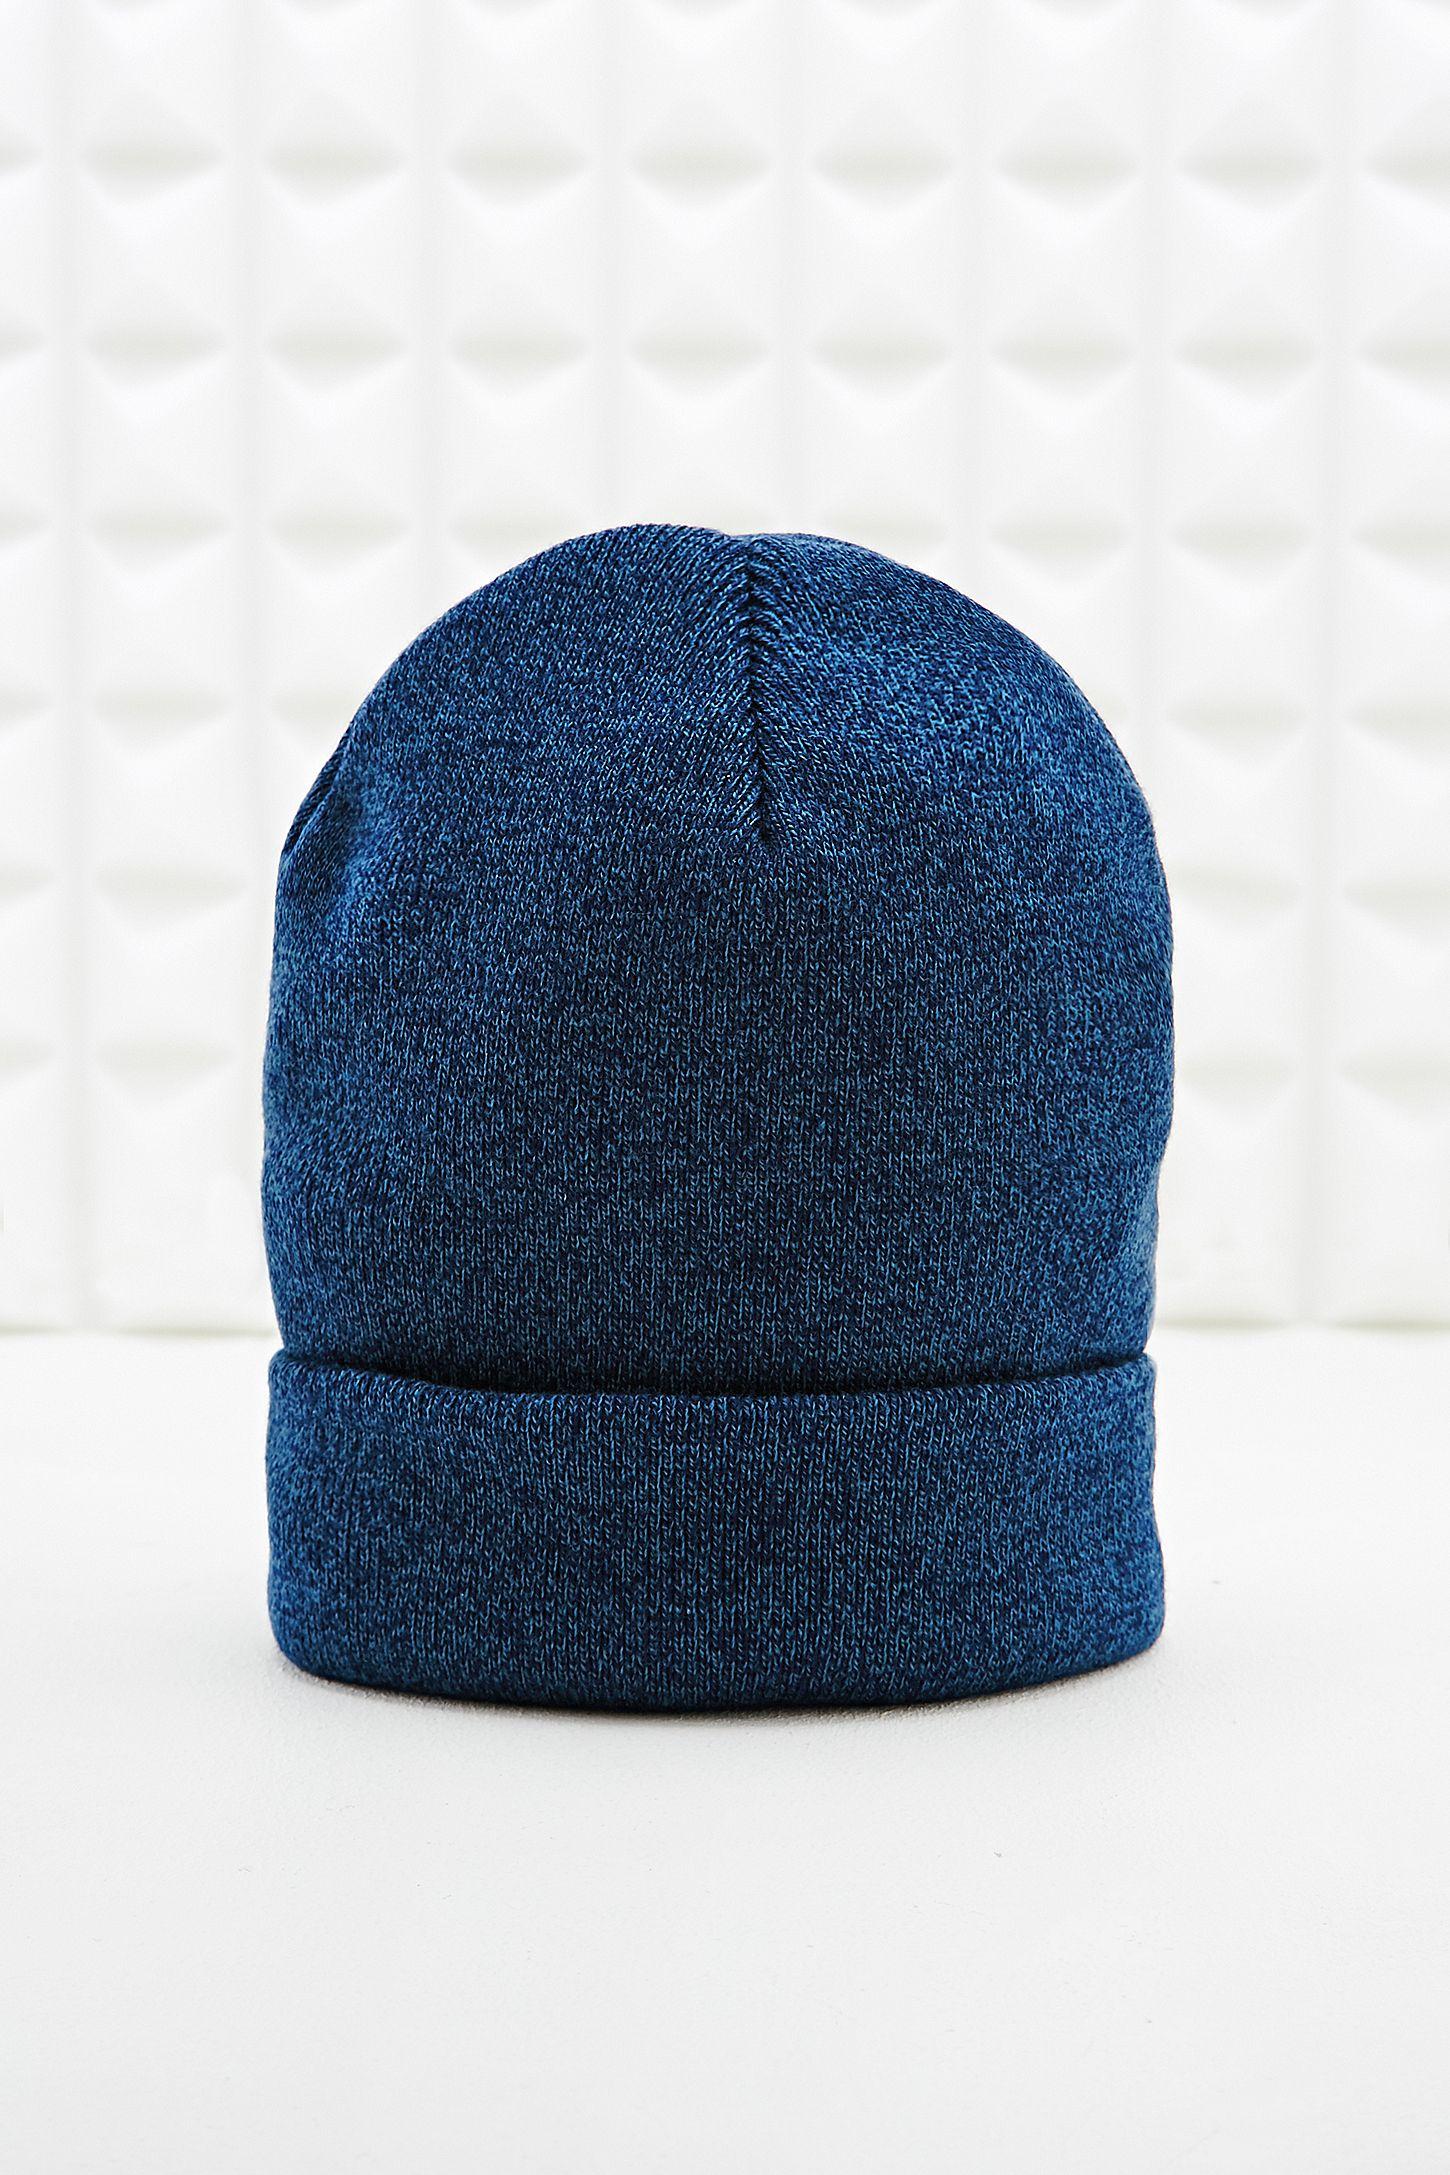 455333a8c32 Sports Beanie Hat in Marled Blue